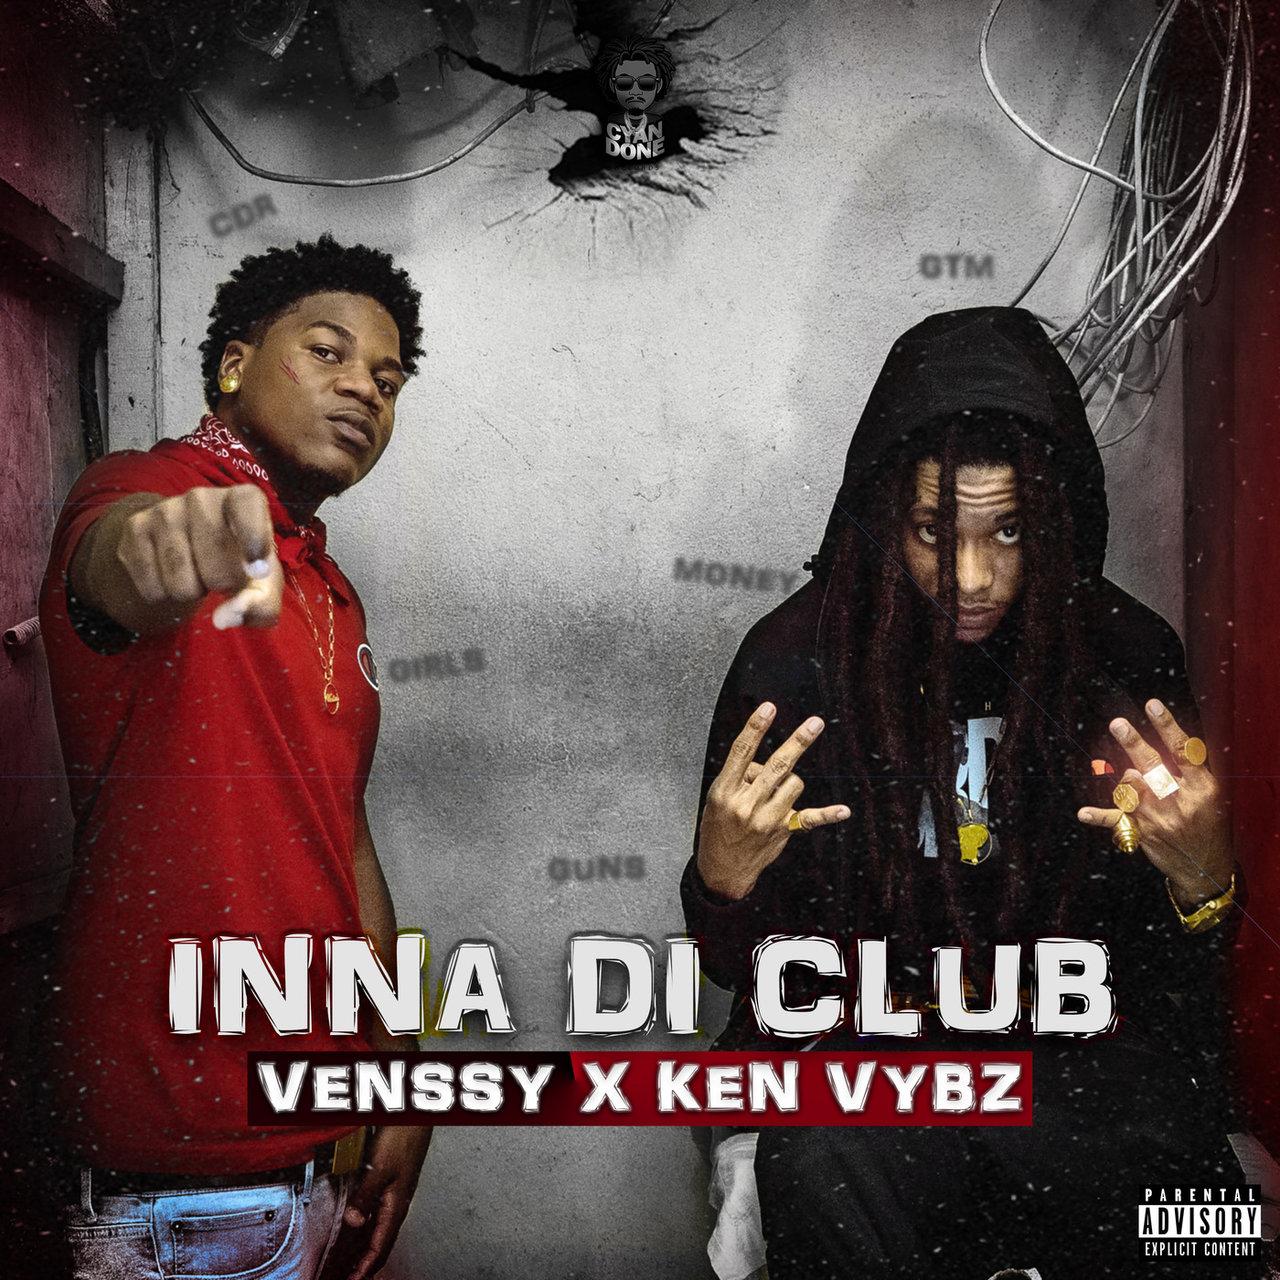 Venssy - Inna Di Club (ft. Ken Vybz) (Cover)